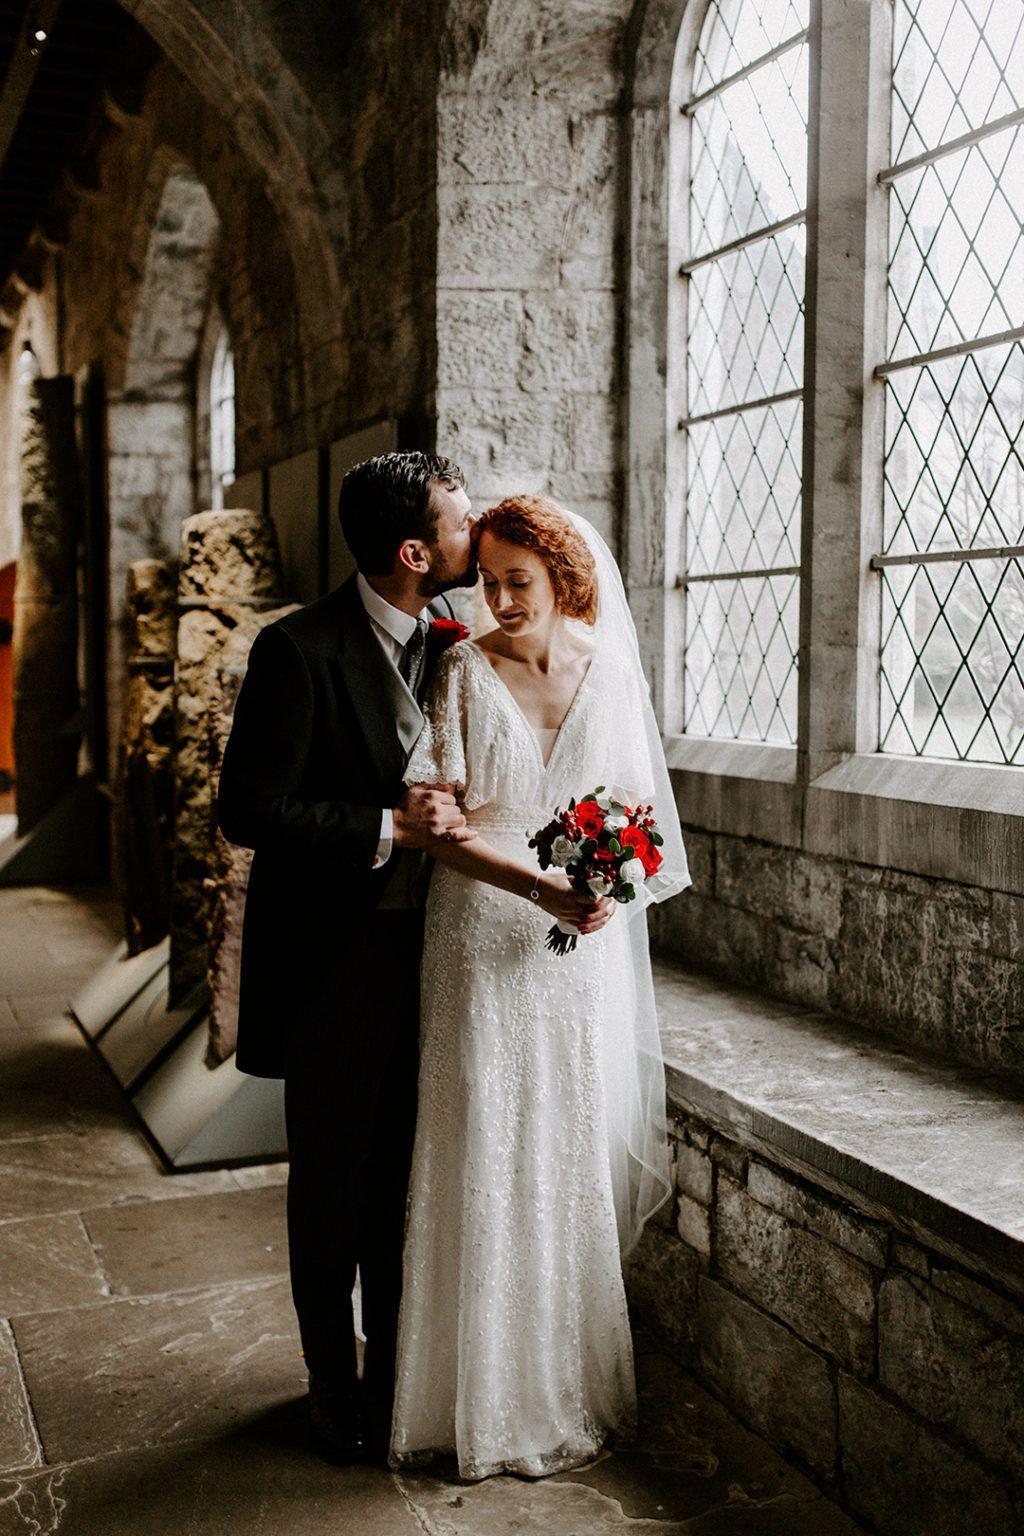 Seasons Of Love Saturday Selection Onefabday Com Ireland In 2020 Winter Wedding Wedding Couples Wedding Styles